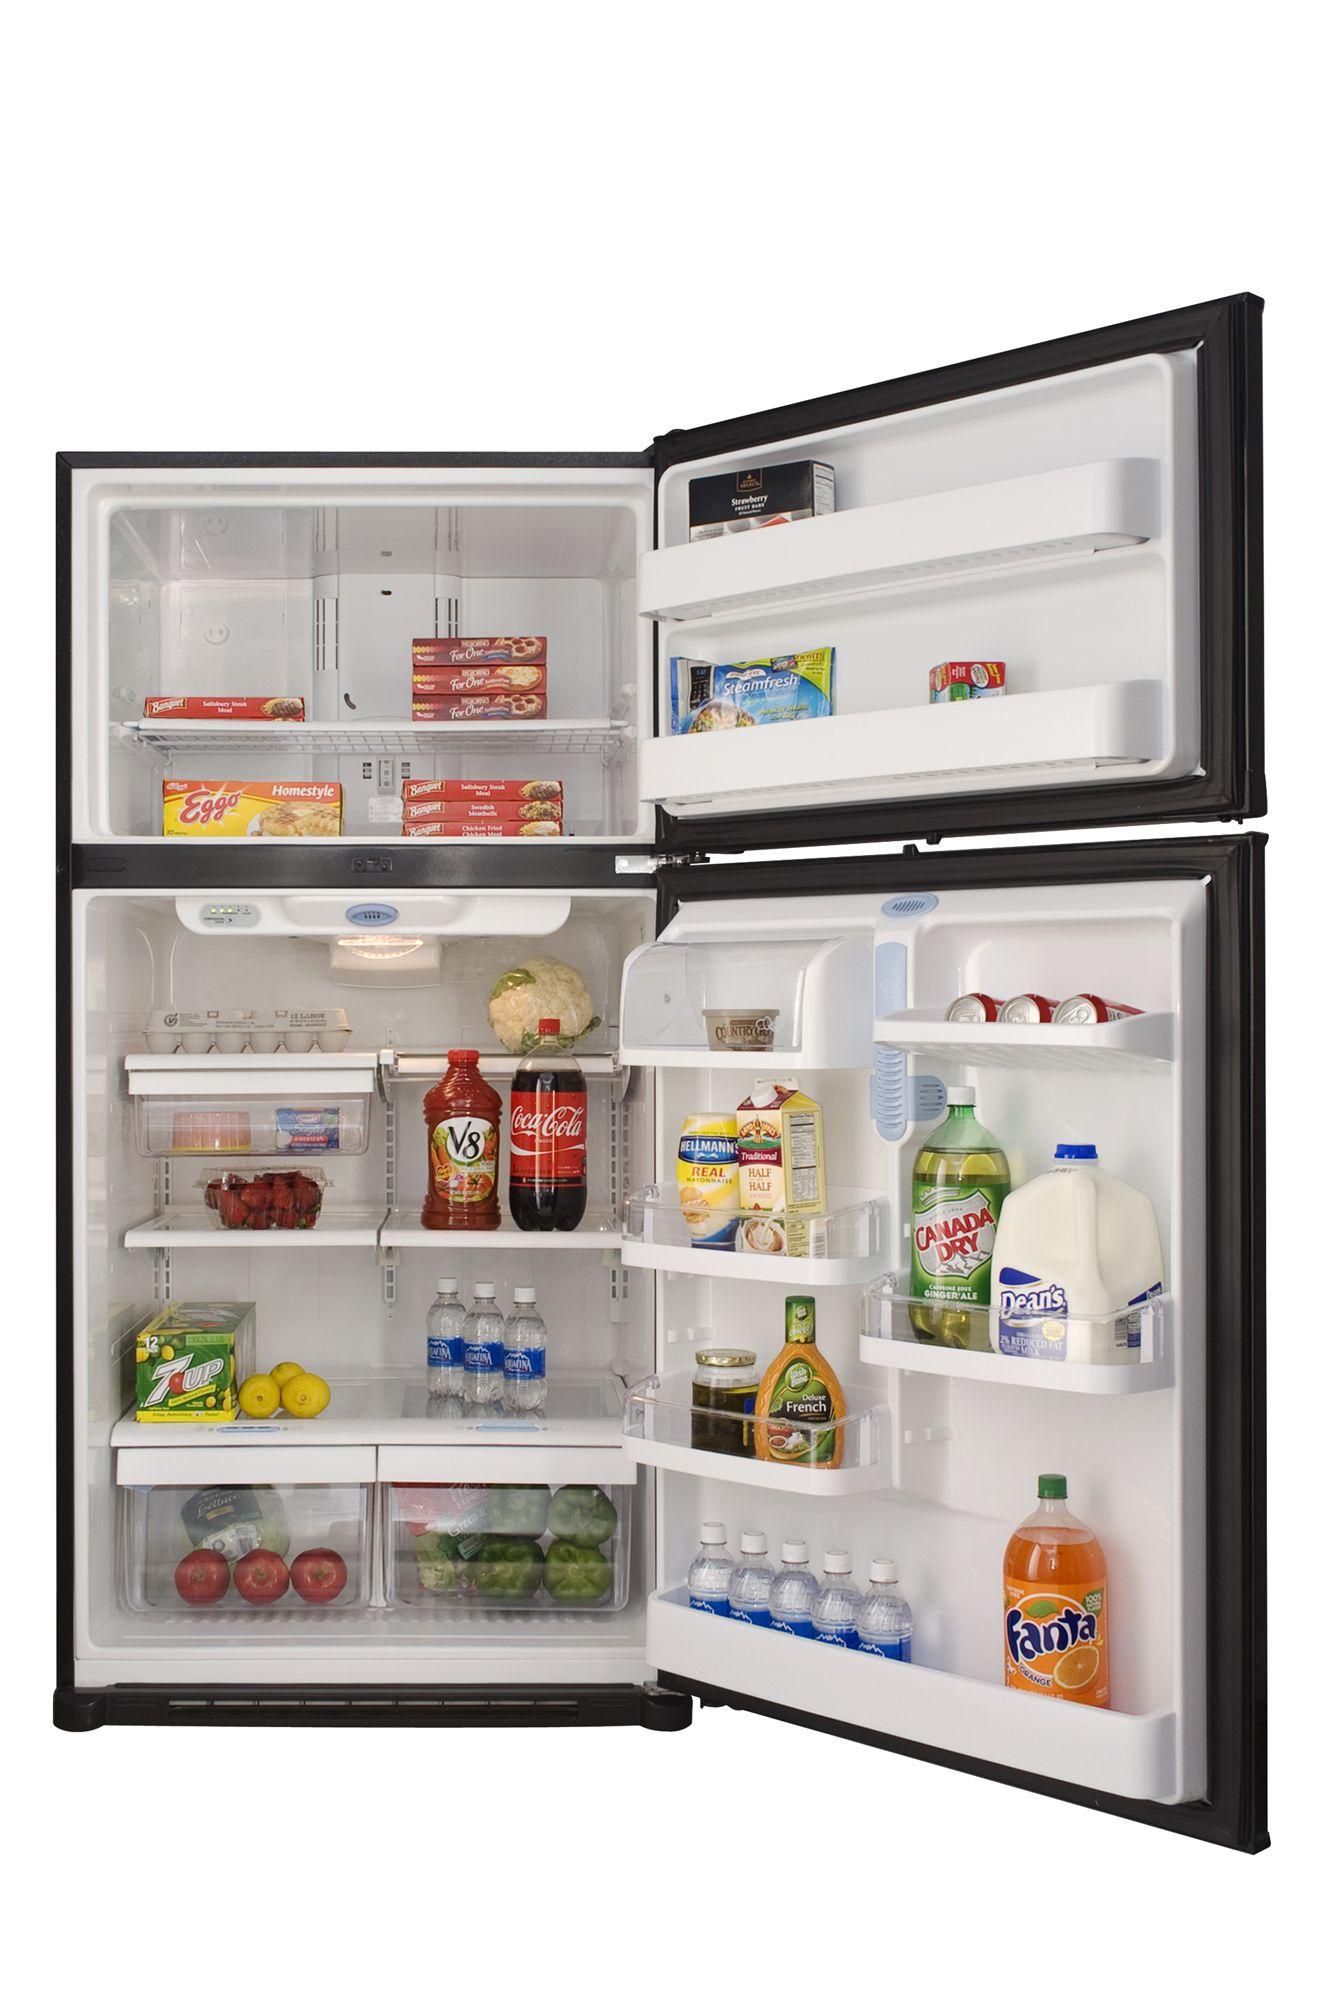 Kenmore 22.1 cu. ft. Top Freezer Refrigerator - Black